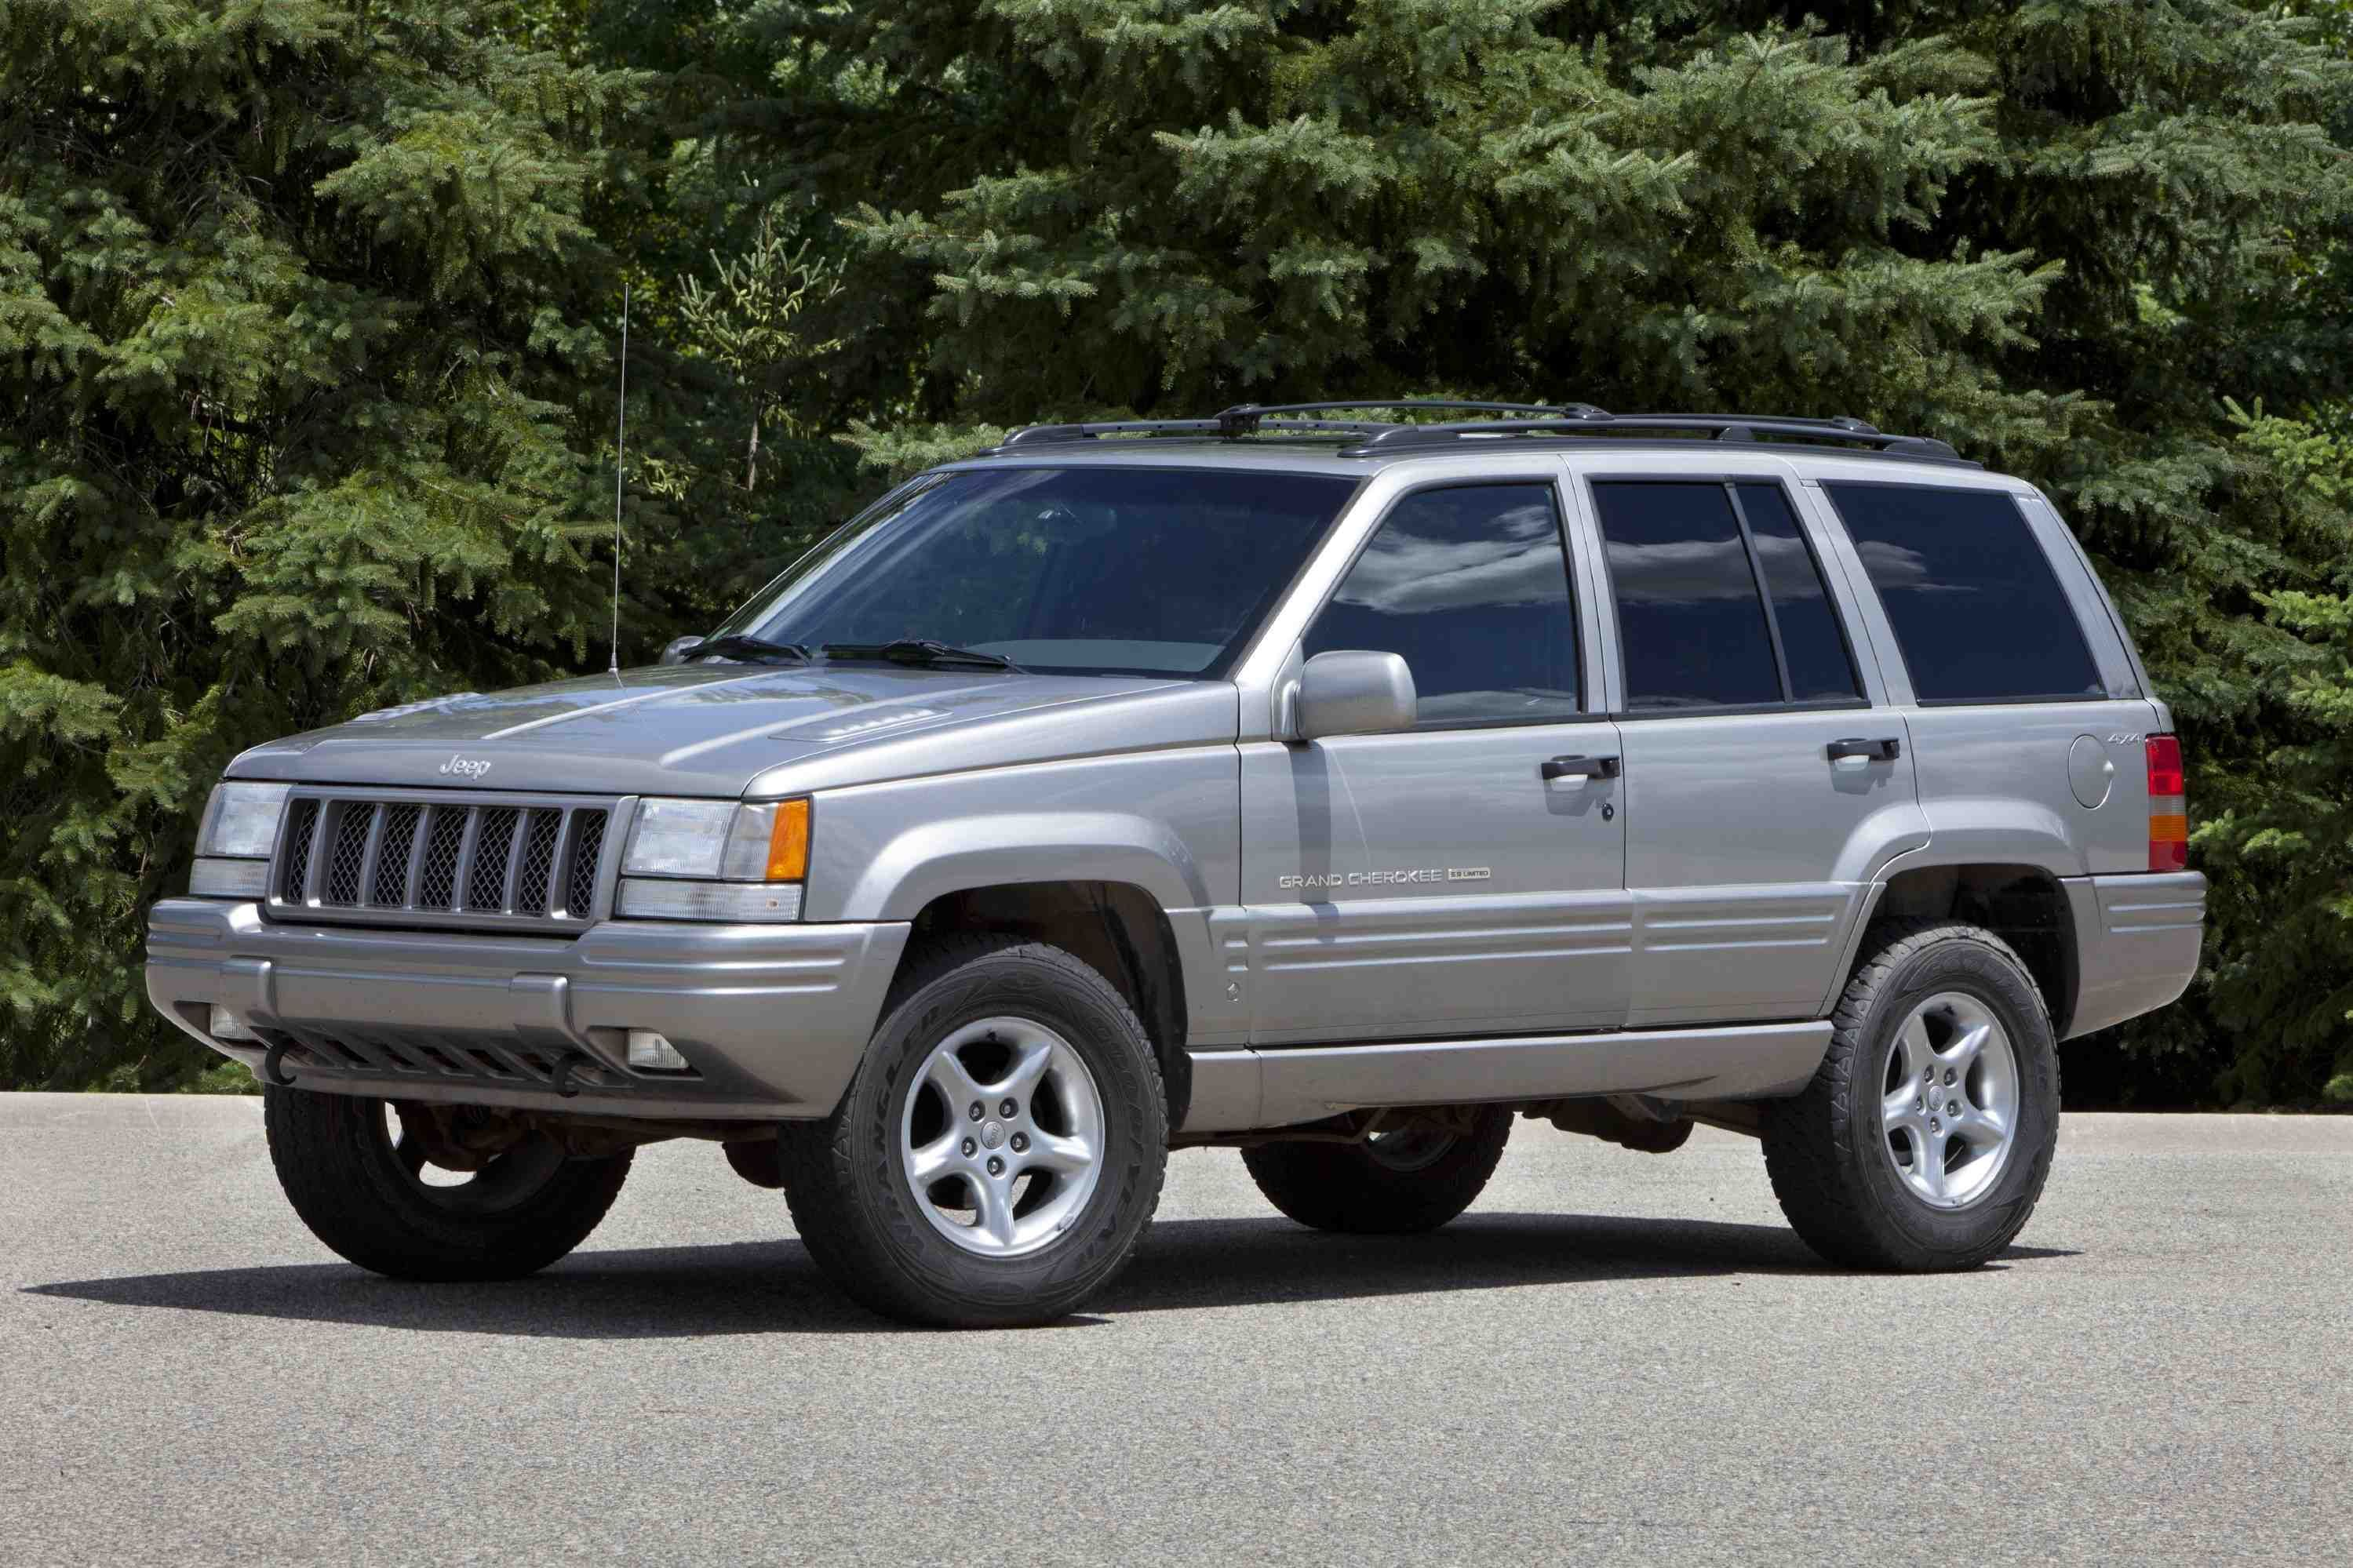 manual de taller jeep grand cherokee zj | 2019 ebook library